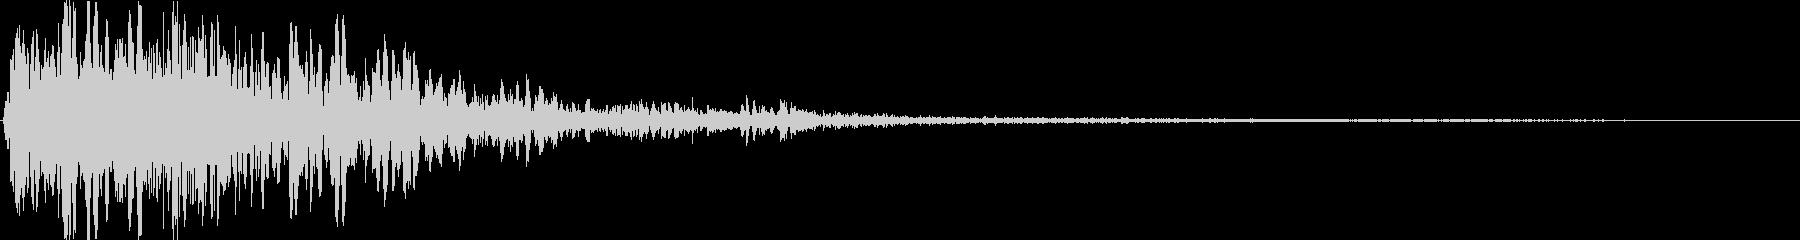 SFX爆発音02の未再生の波形